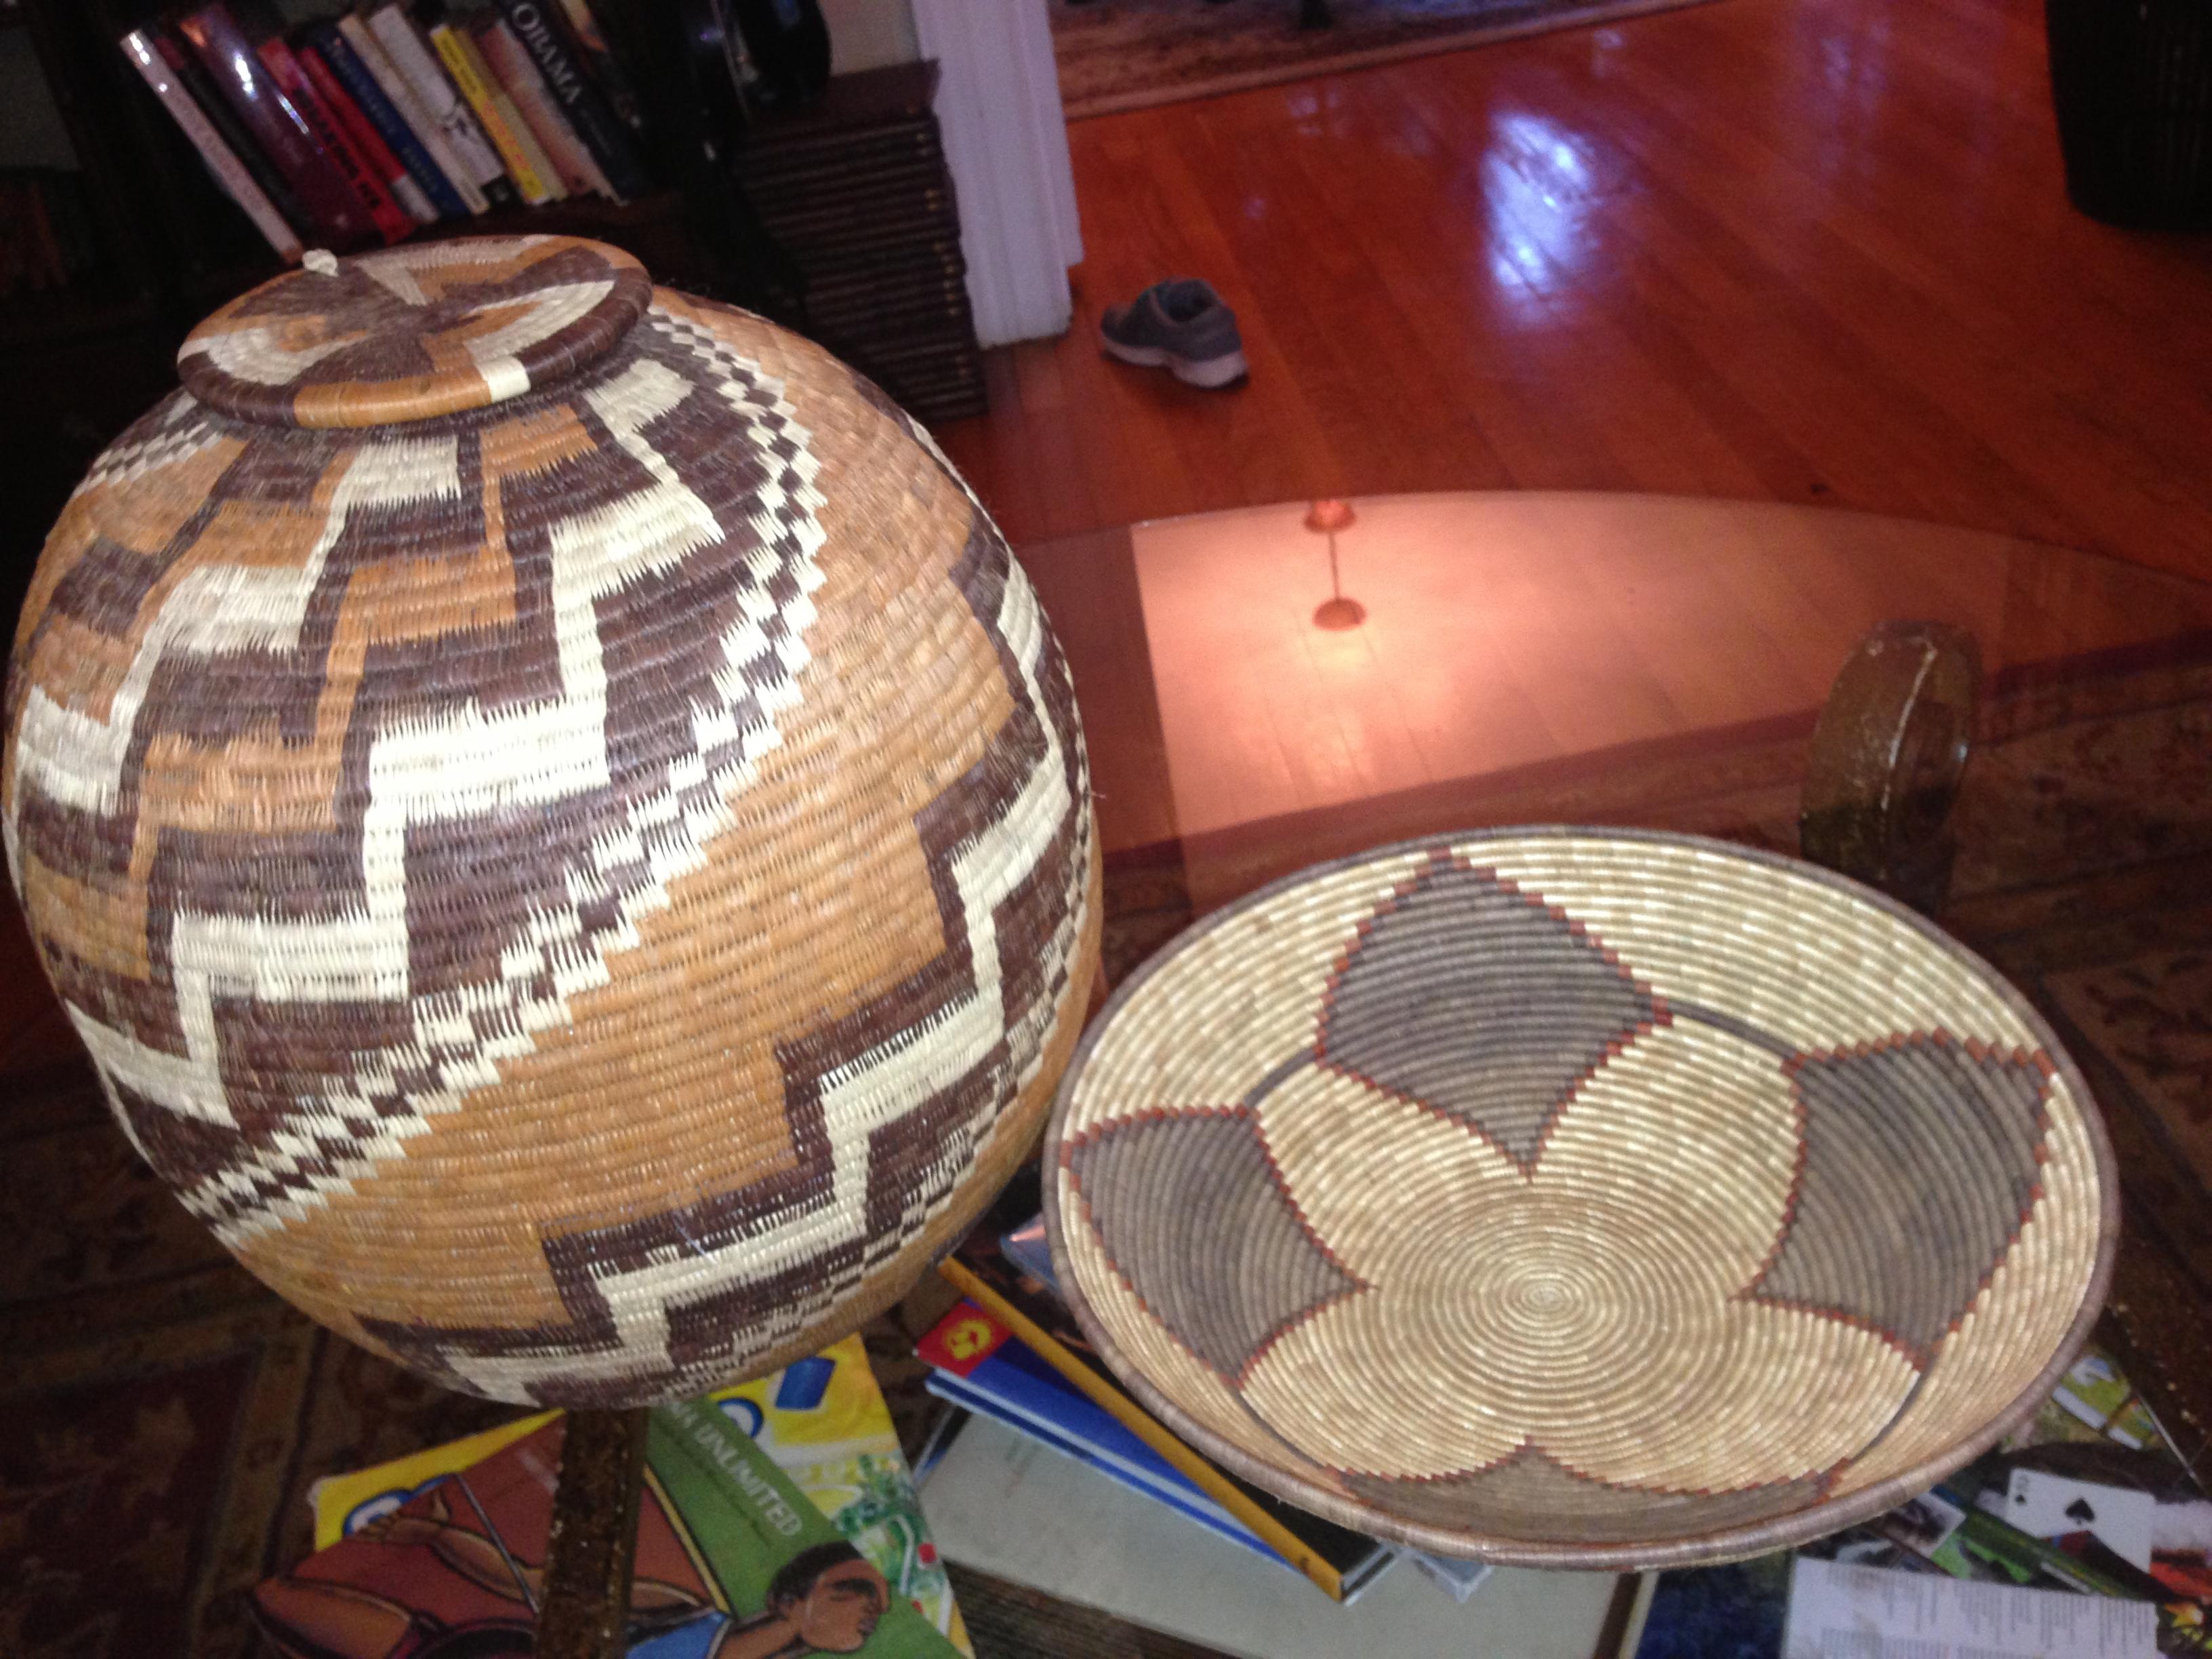 Item: Botswana bowl